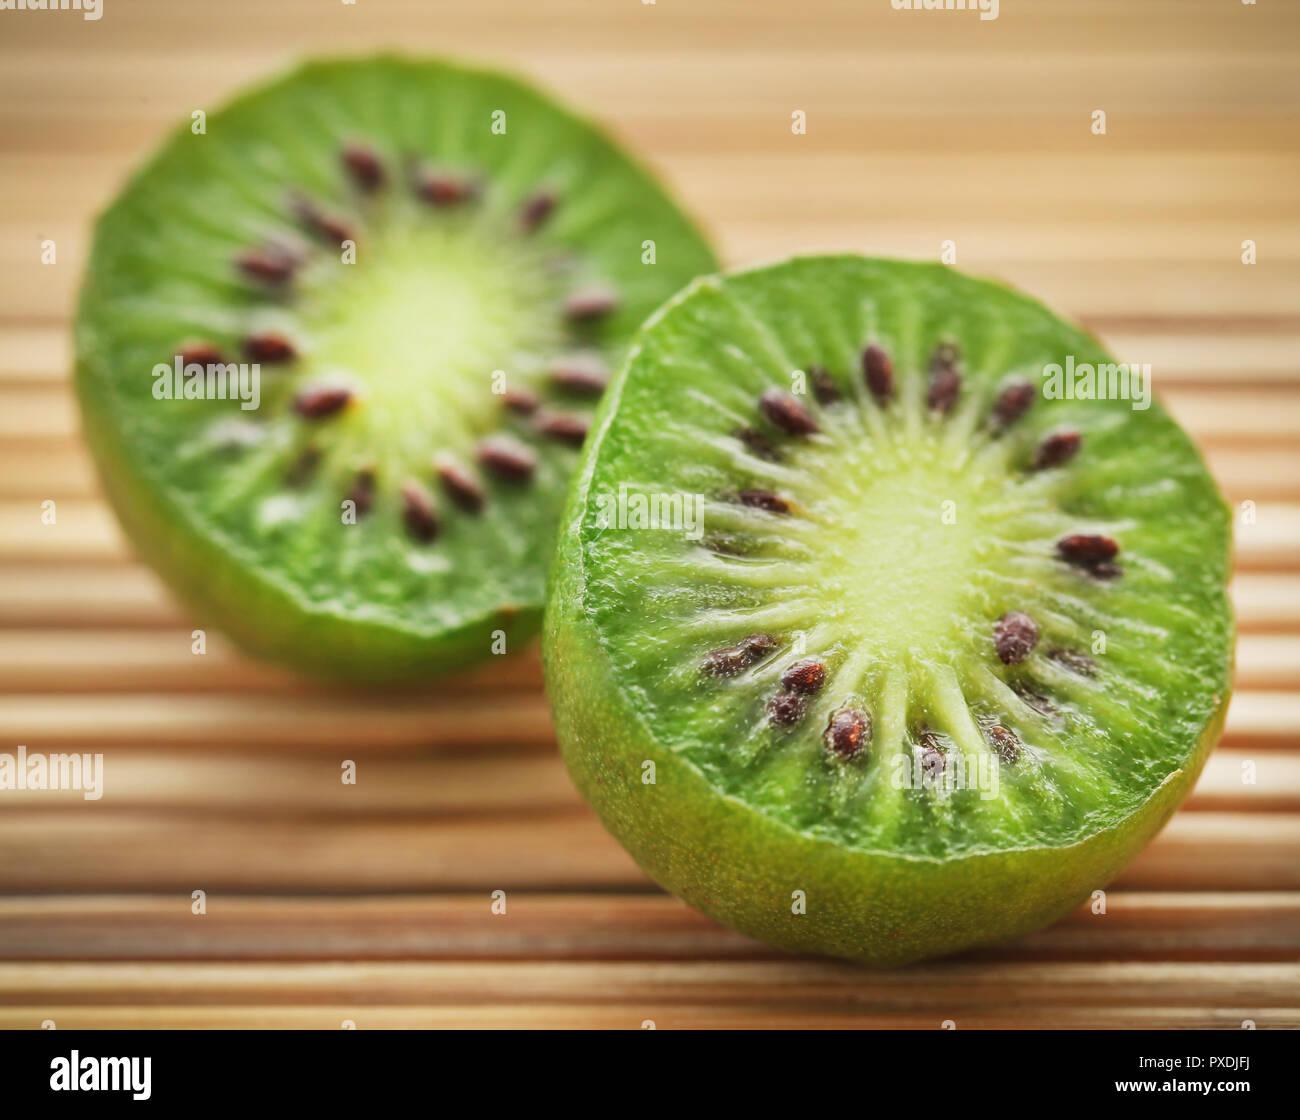 Baby kiwi or Kiwi berry on natural surface - Stock Image